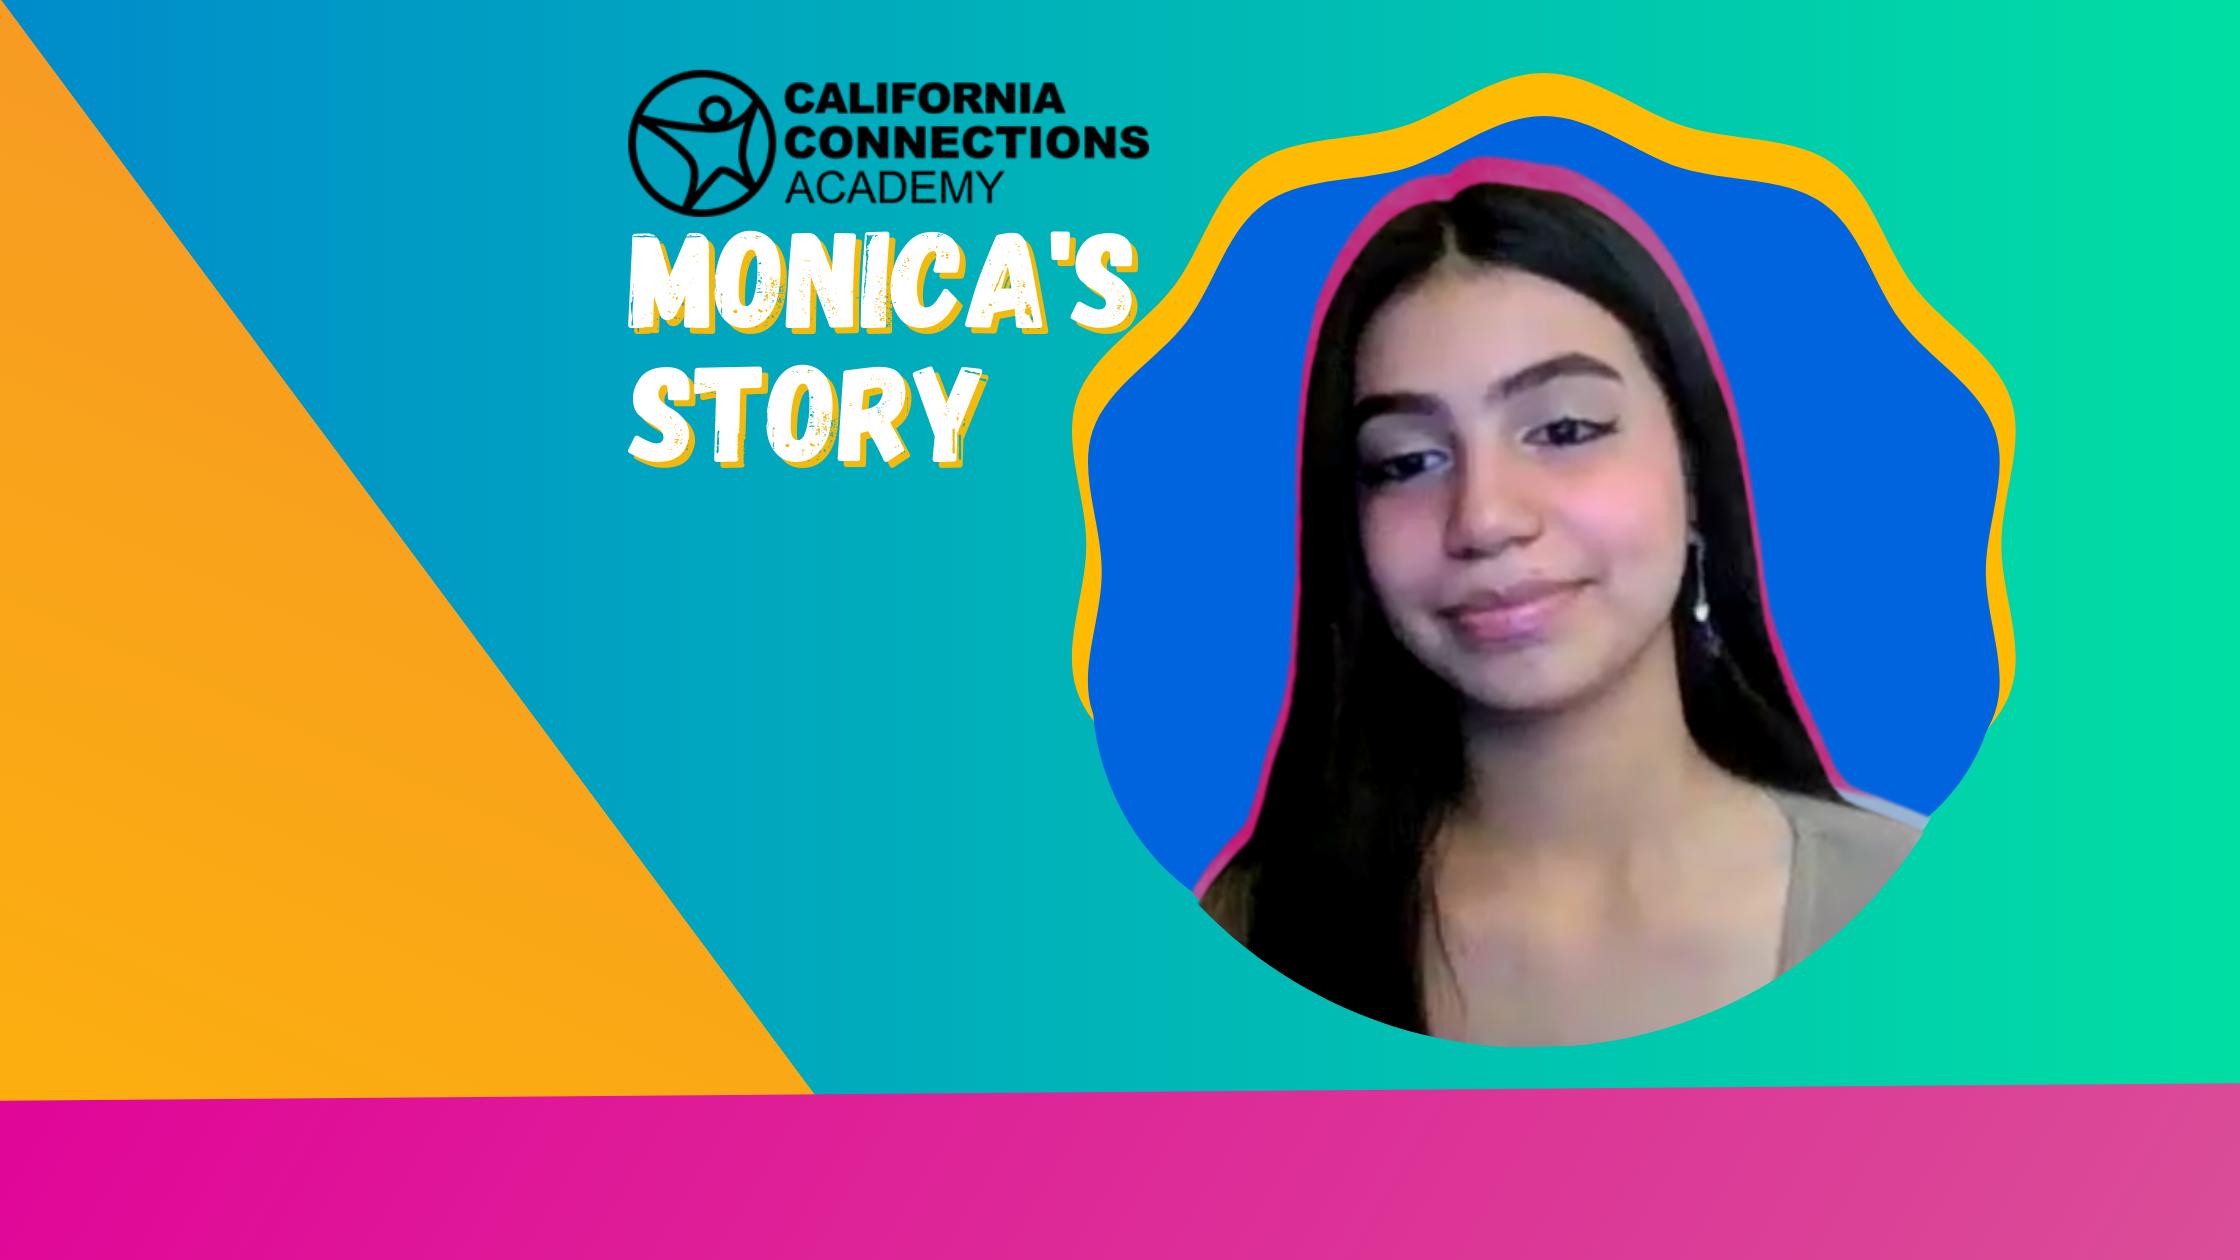 Read Monica's Story